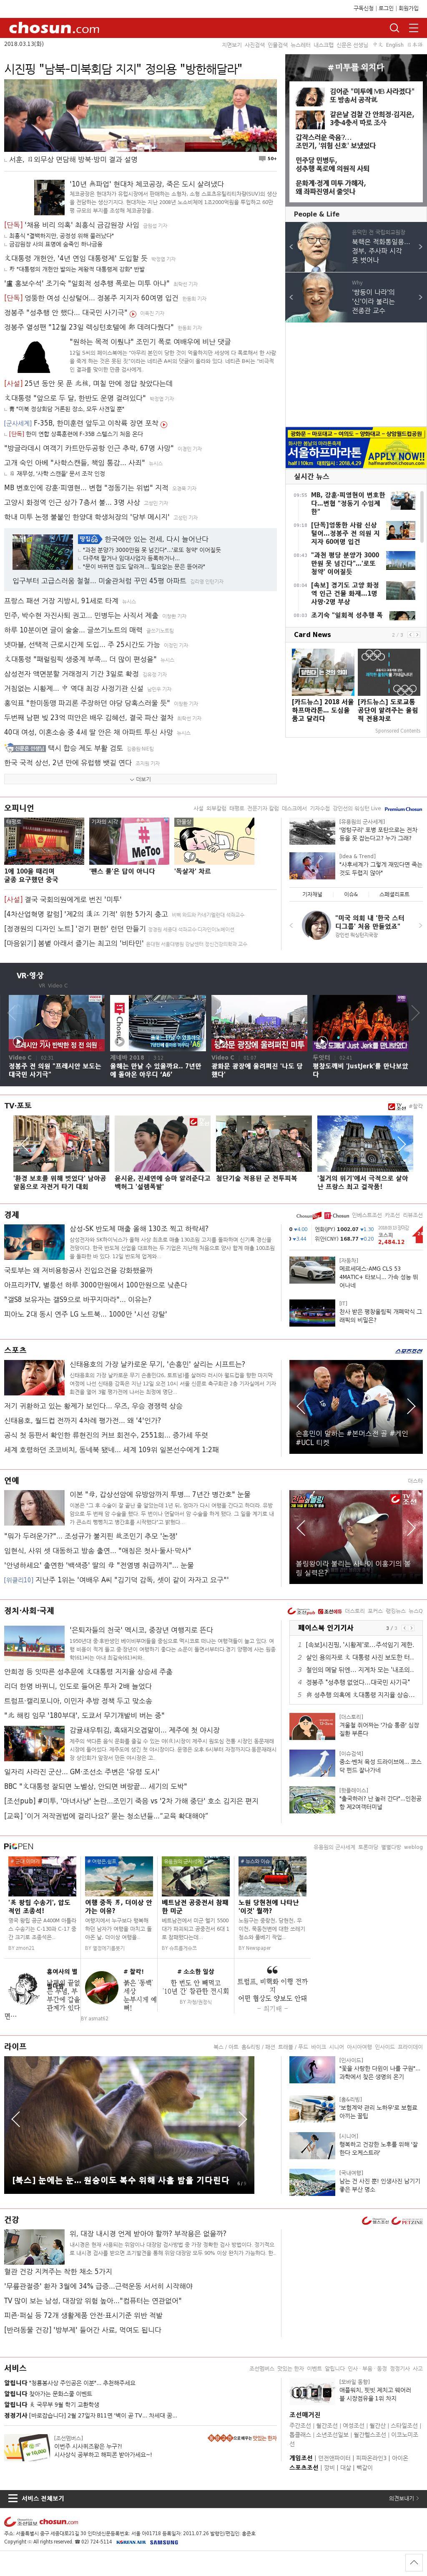 chosun.com at Monday March 12, 2018, 4:03 p.m. UTC